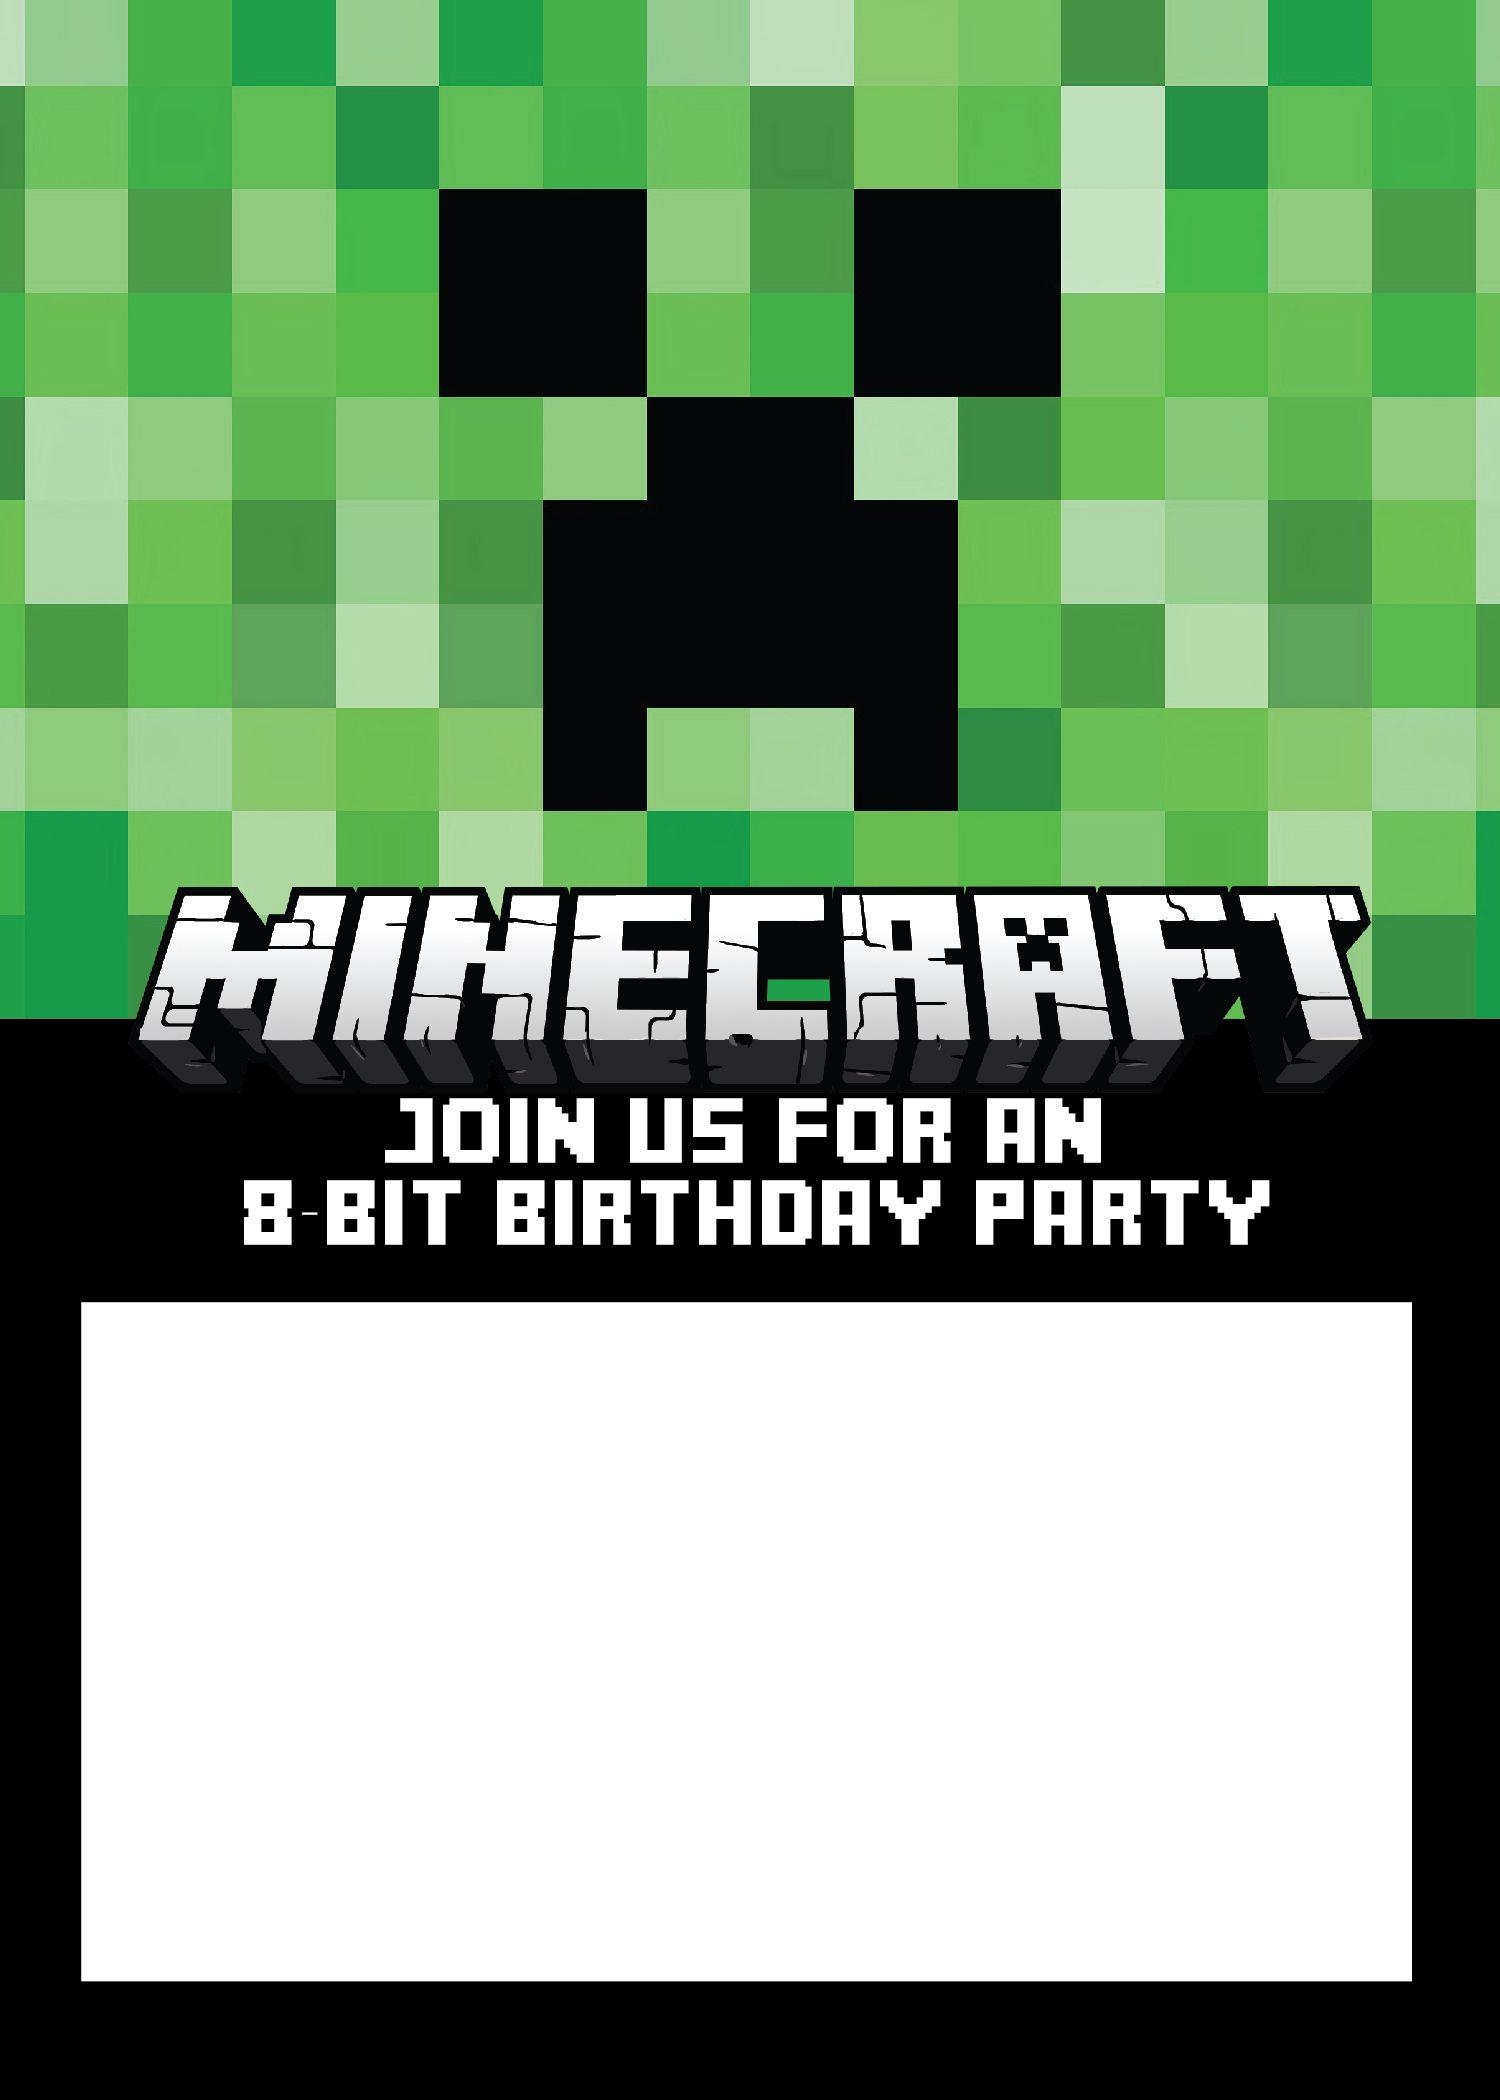 Invitacion Fiesta Minecraf Pinterest Birthdays - Minecraft birthday invitation card template